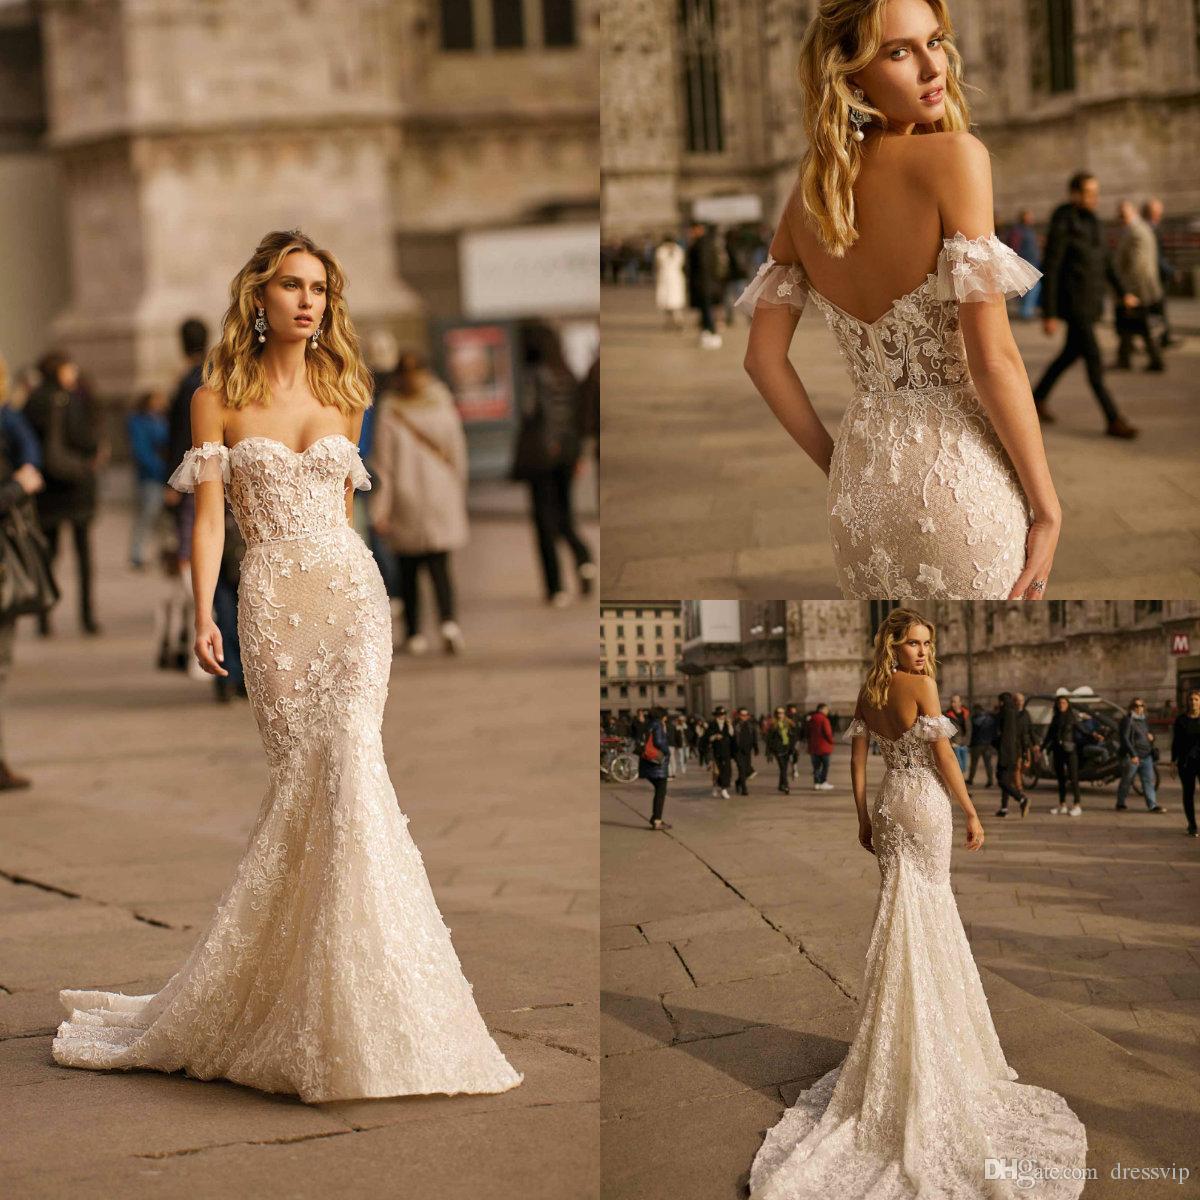 Sexy Mermaid Berta Wedding Dresses Off The Shoulder Lace Applique Bohemian Bridal Gowns Sweep Train Plus Size Vestidos De Novia 2020